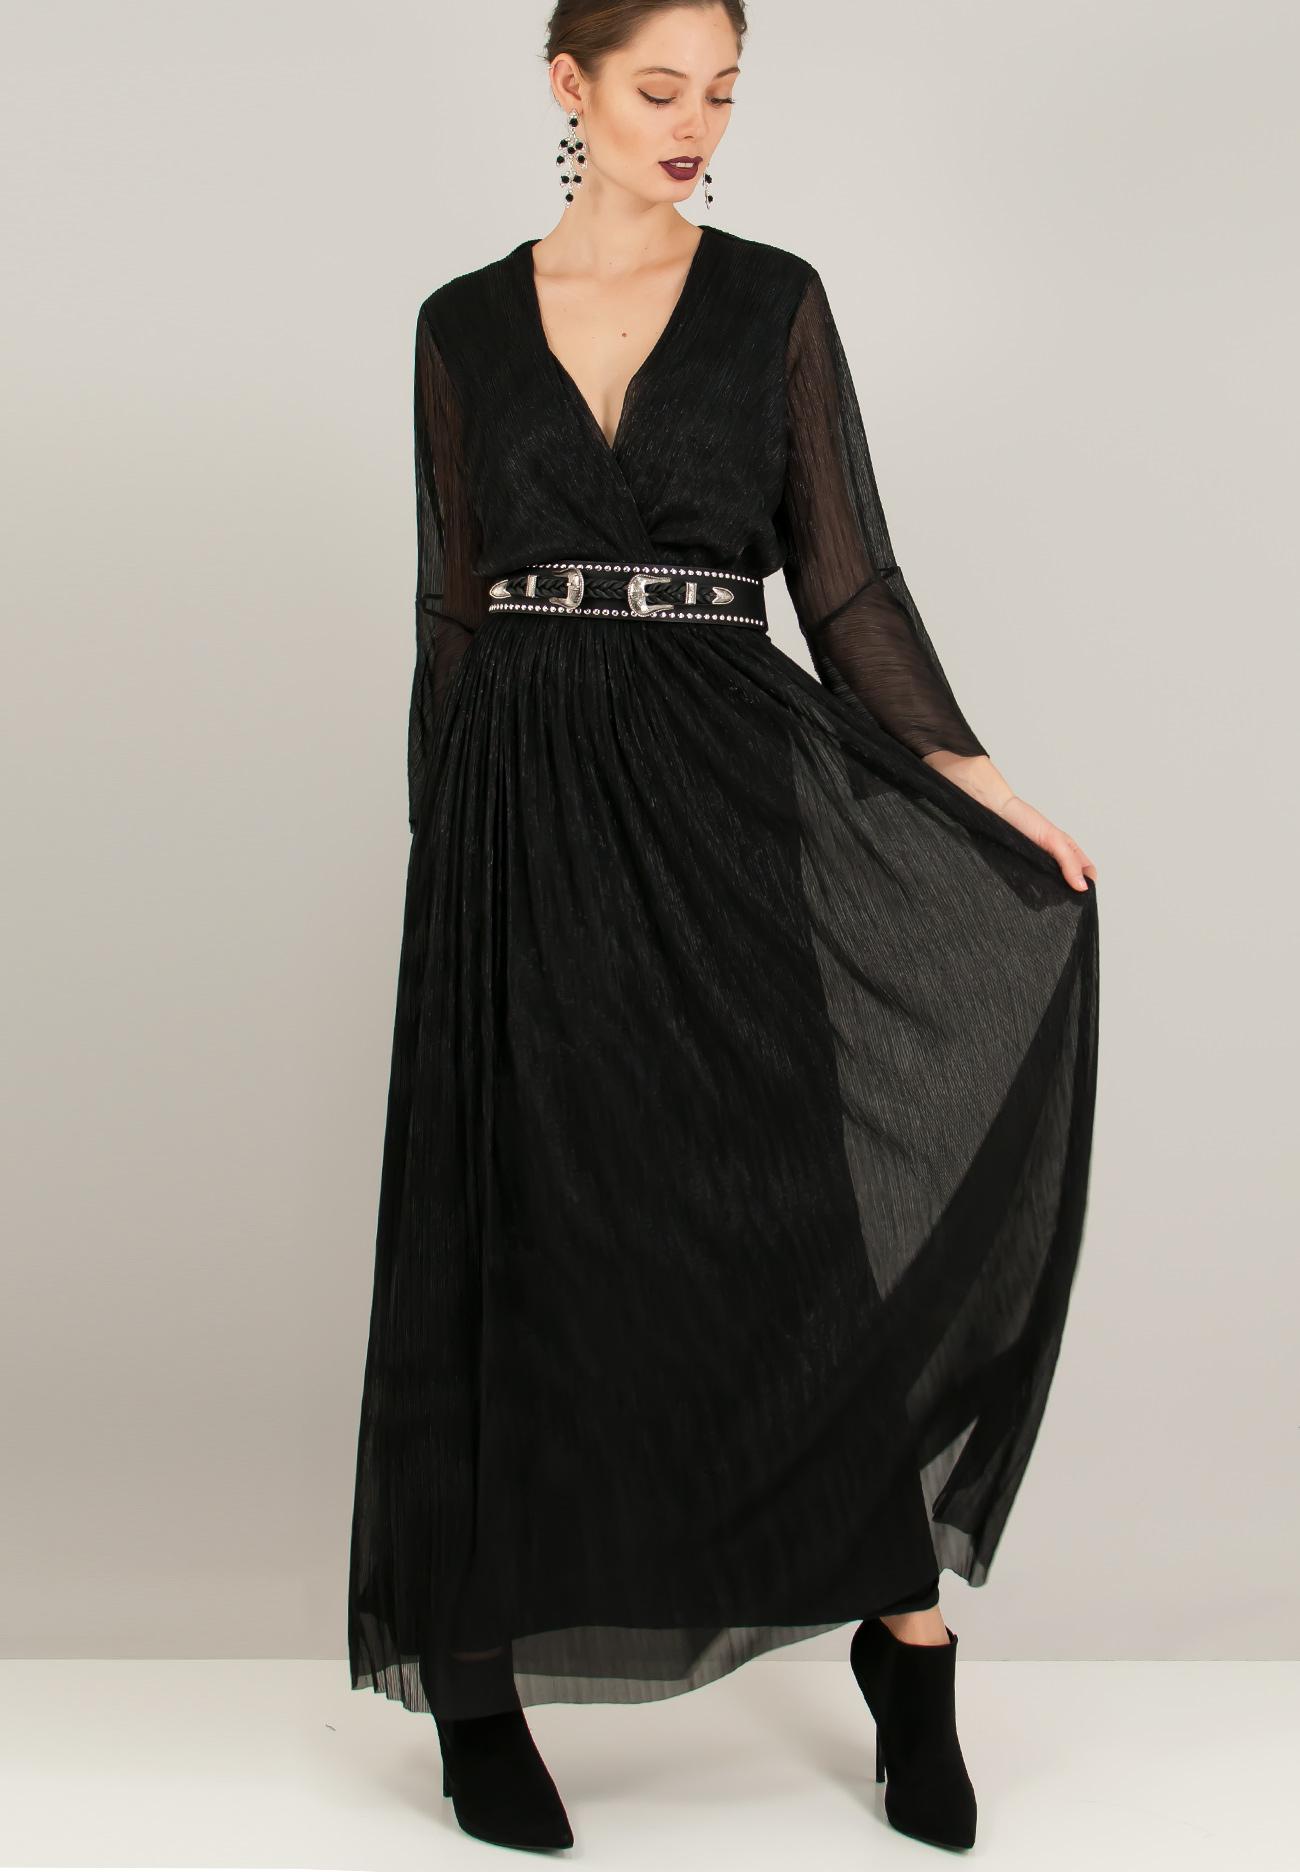 120347cb8857 Μακρύ πλισέ φόρεμα - ZIC ZAC